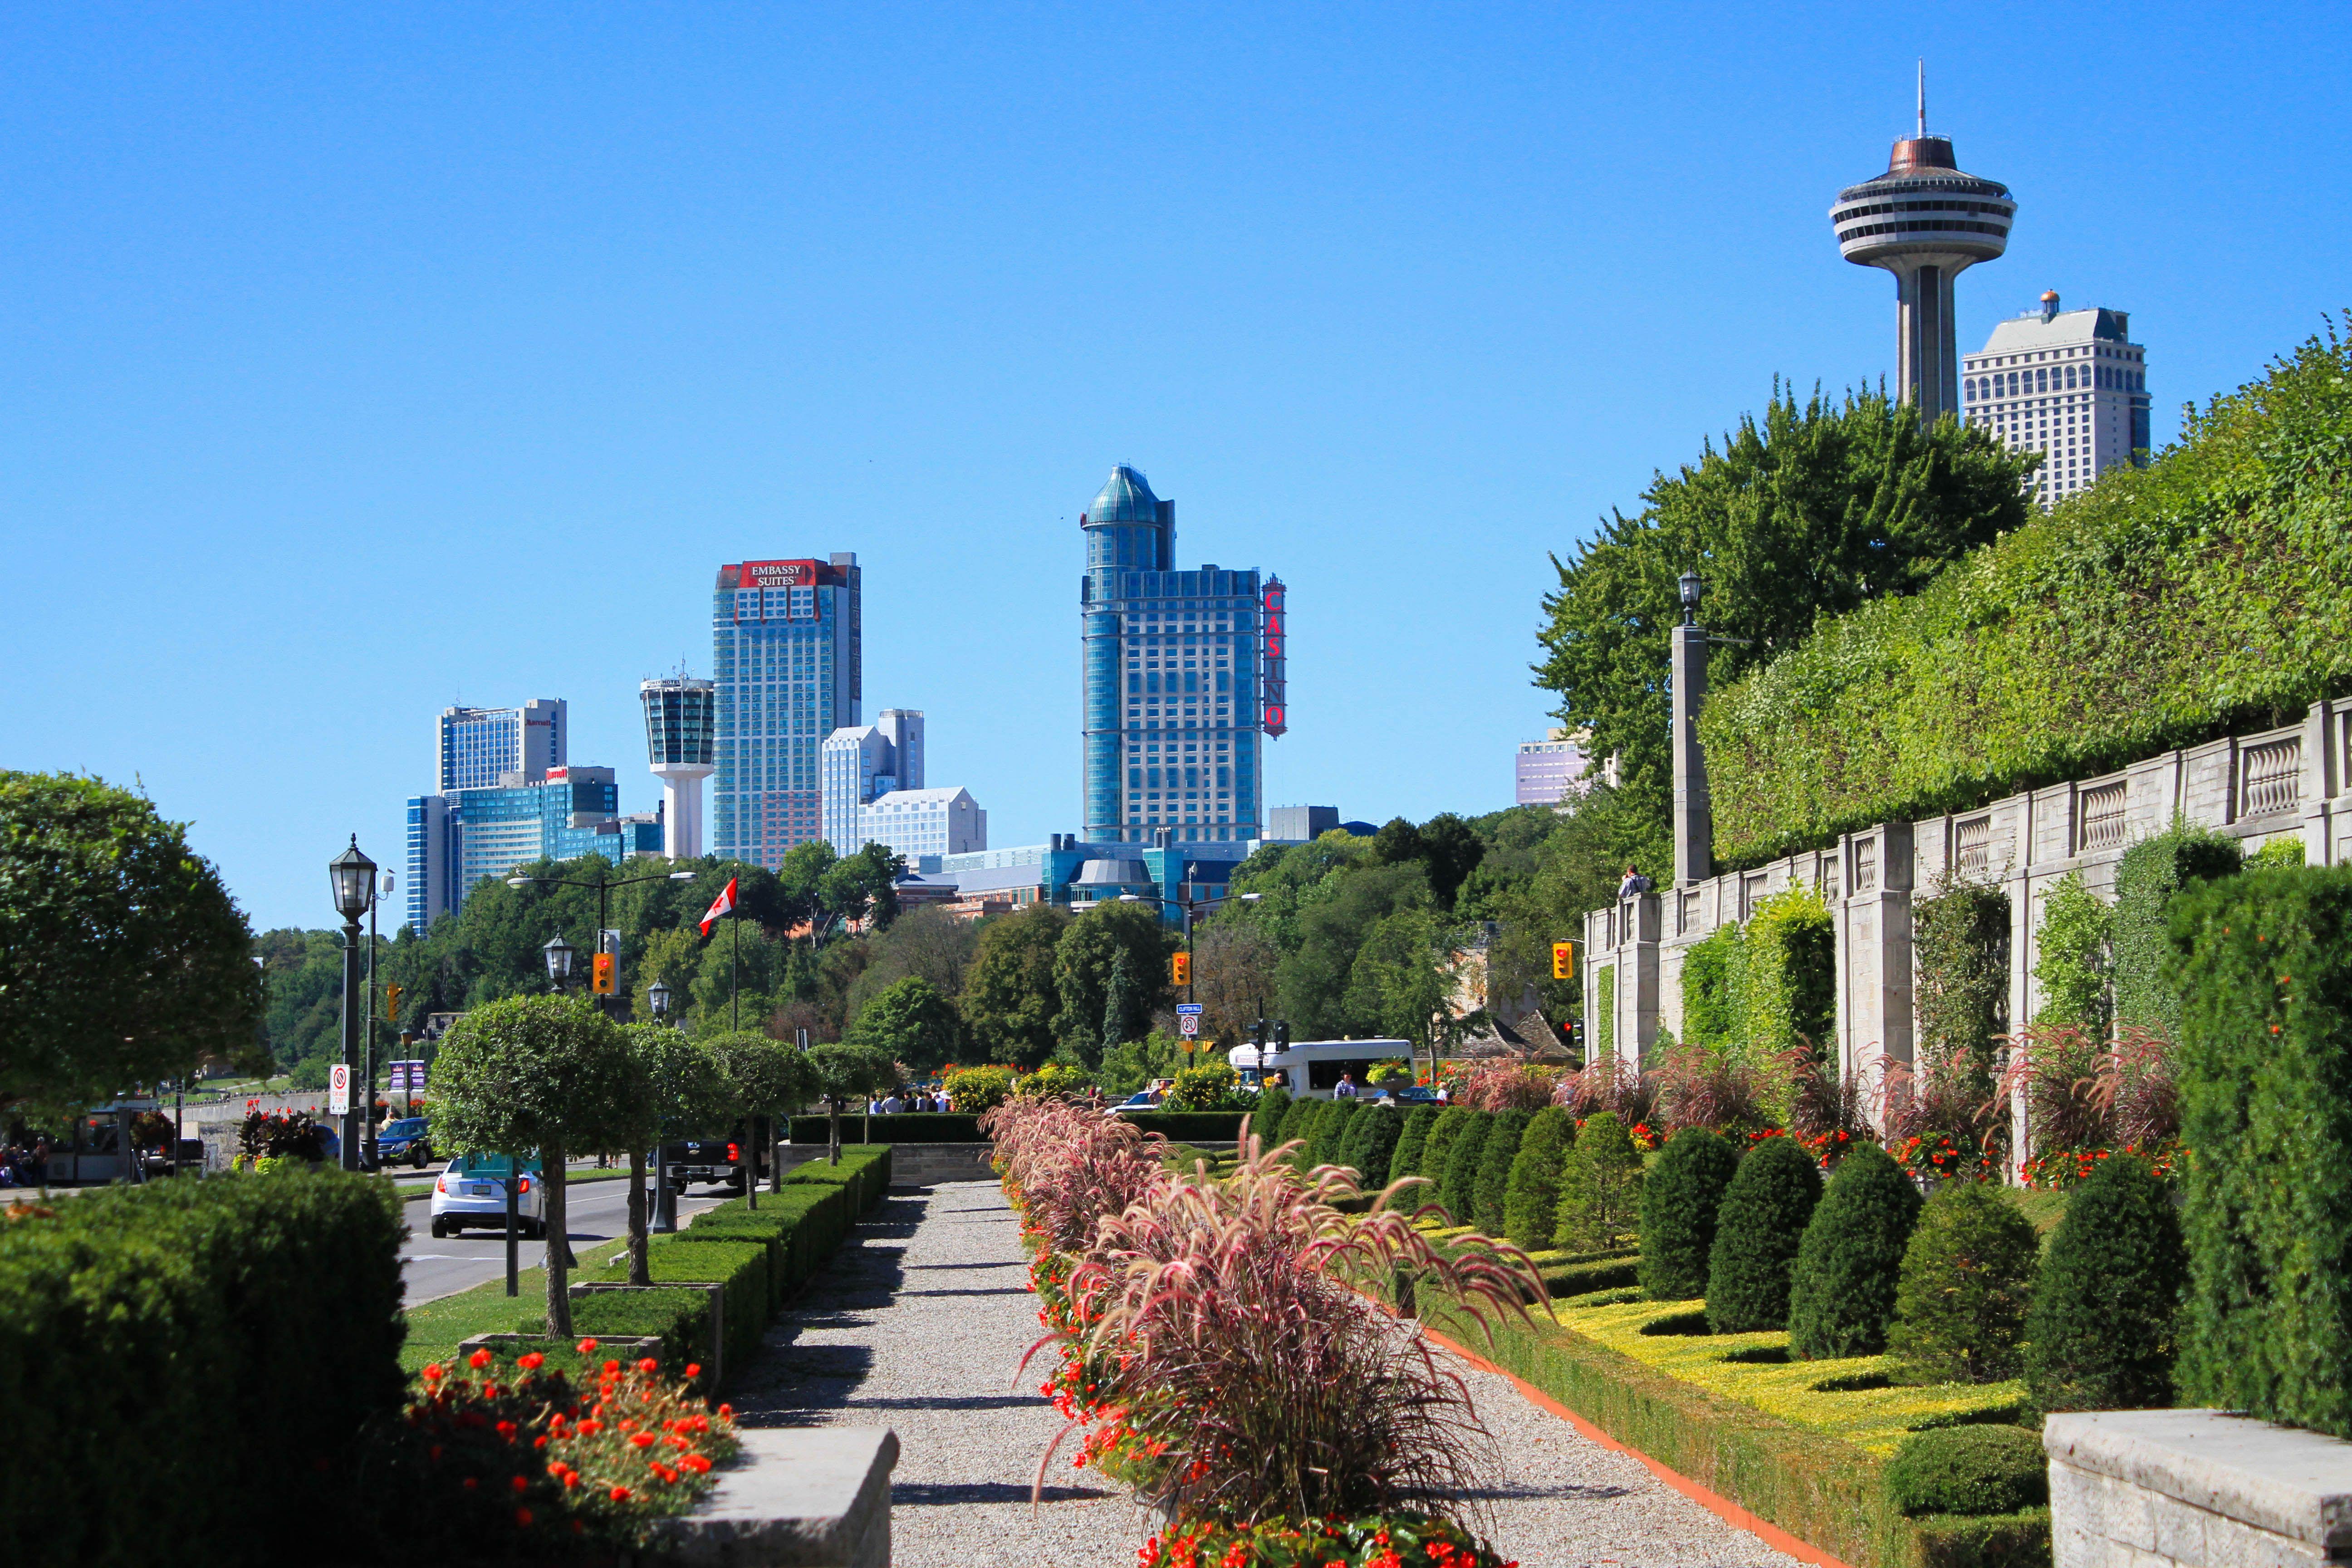 NIAGARA FALLS Seattle skyline, Skyline, Niagara falls